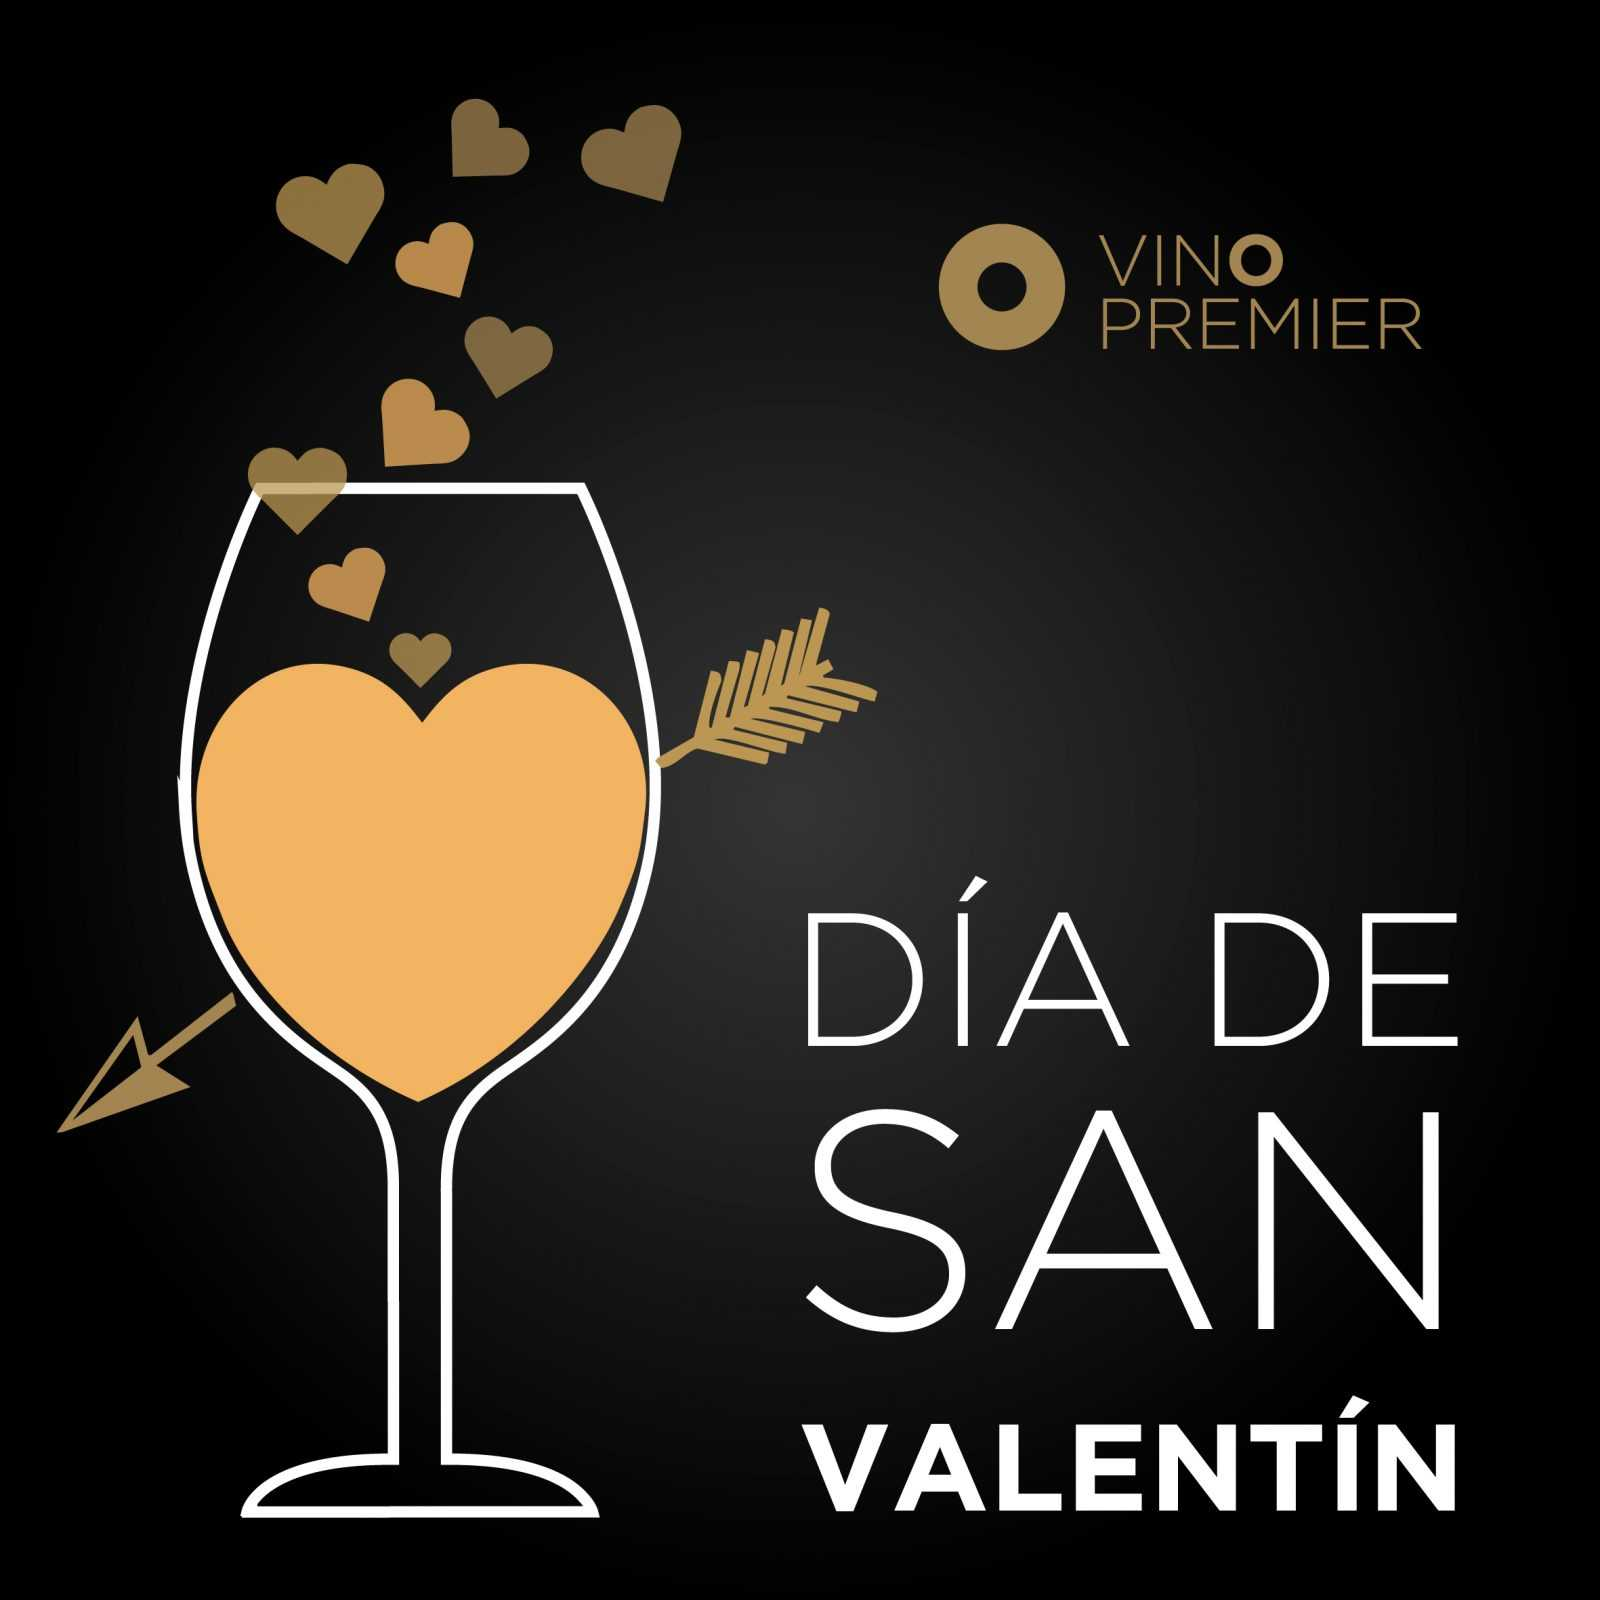 Vinos para enamorar este San Valentín